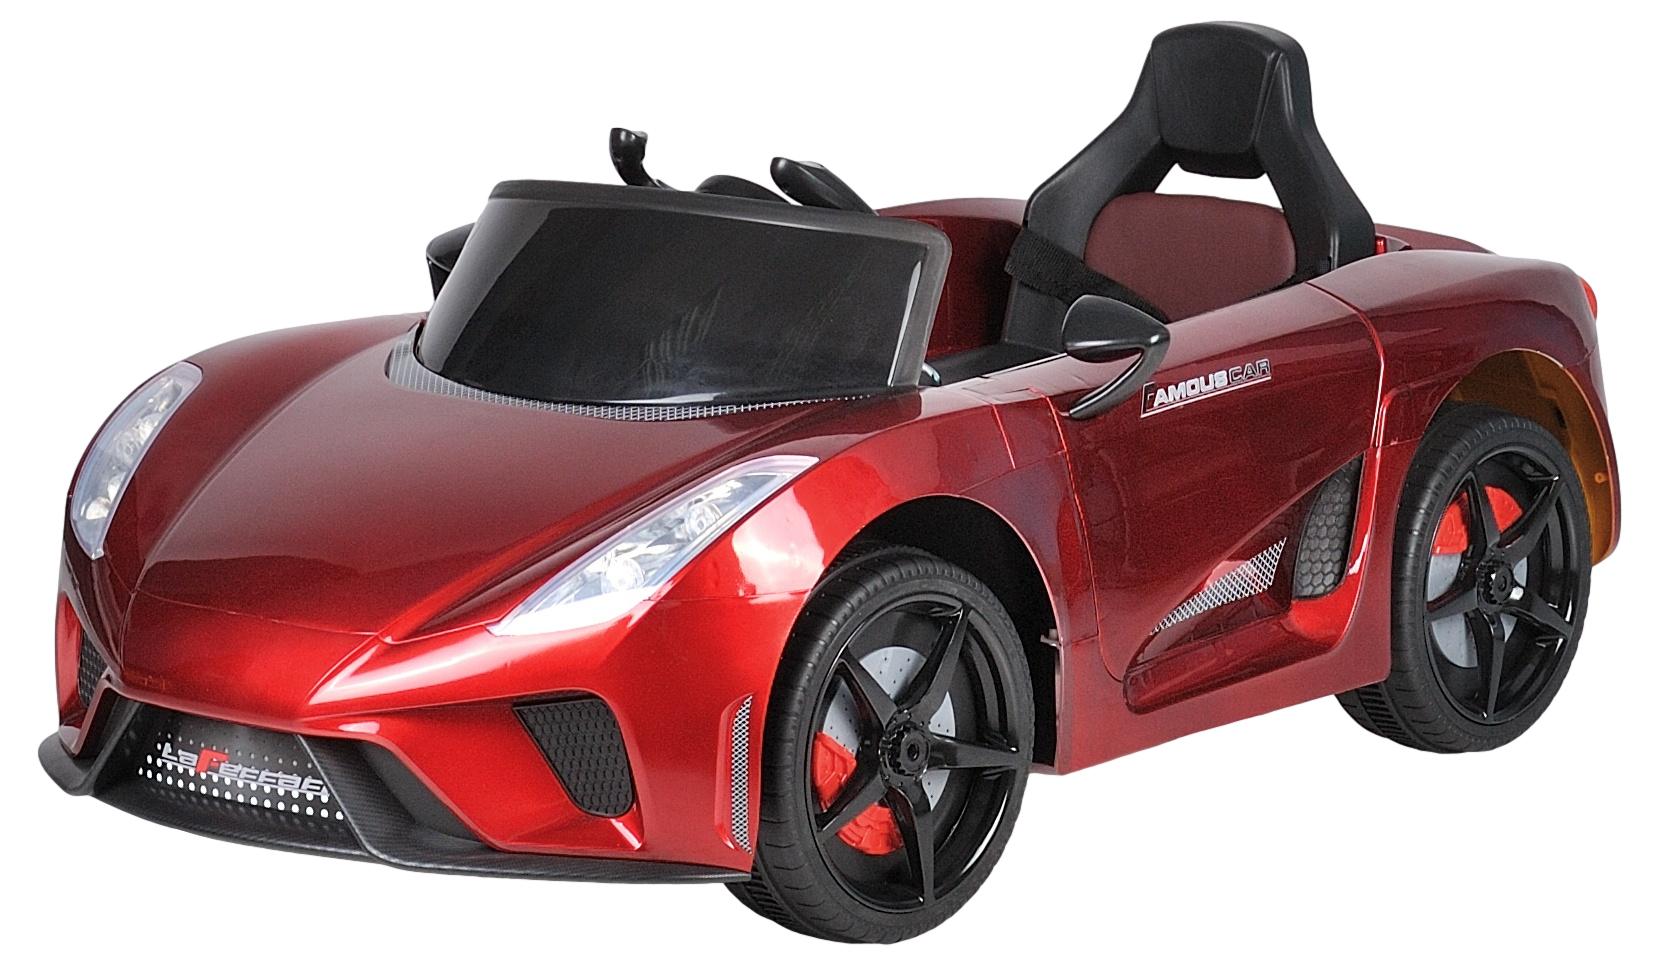 Купить Электромобиль Farfello JJ0102 красный,